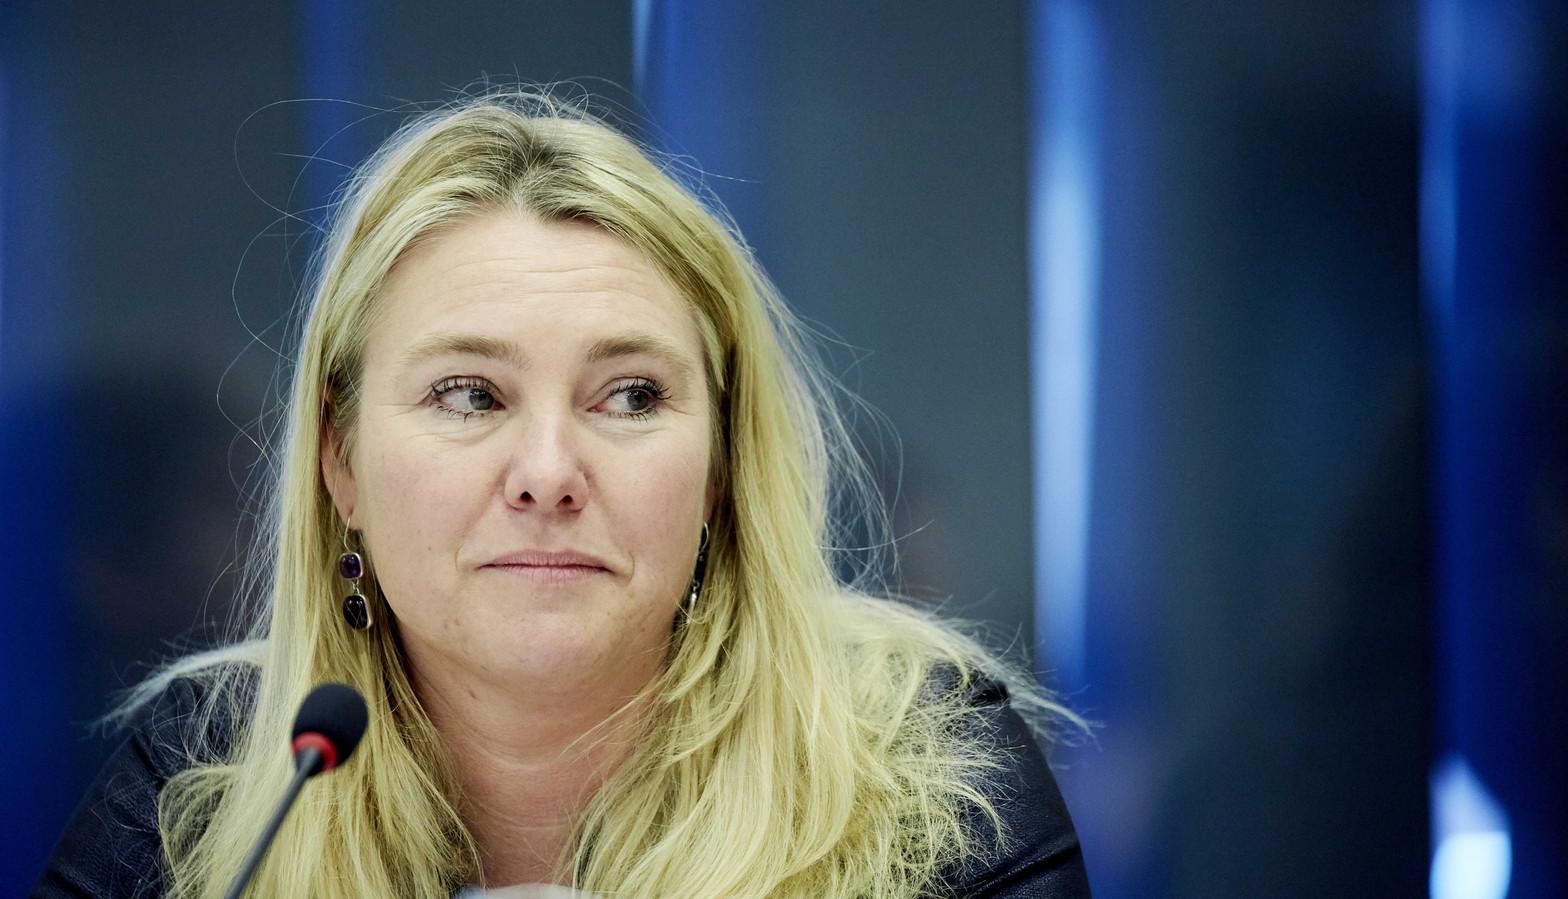 Minister Melanie Schultz van Infrastructuur en Milieu.